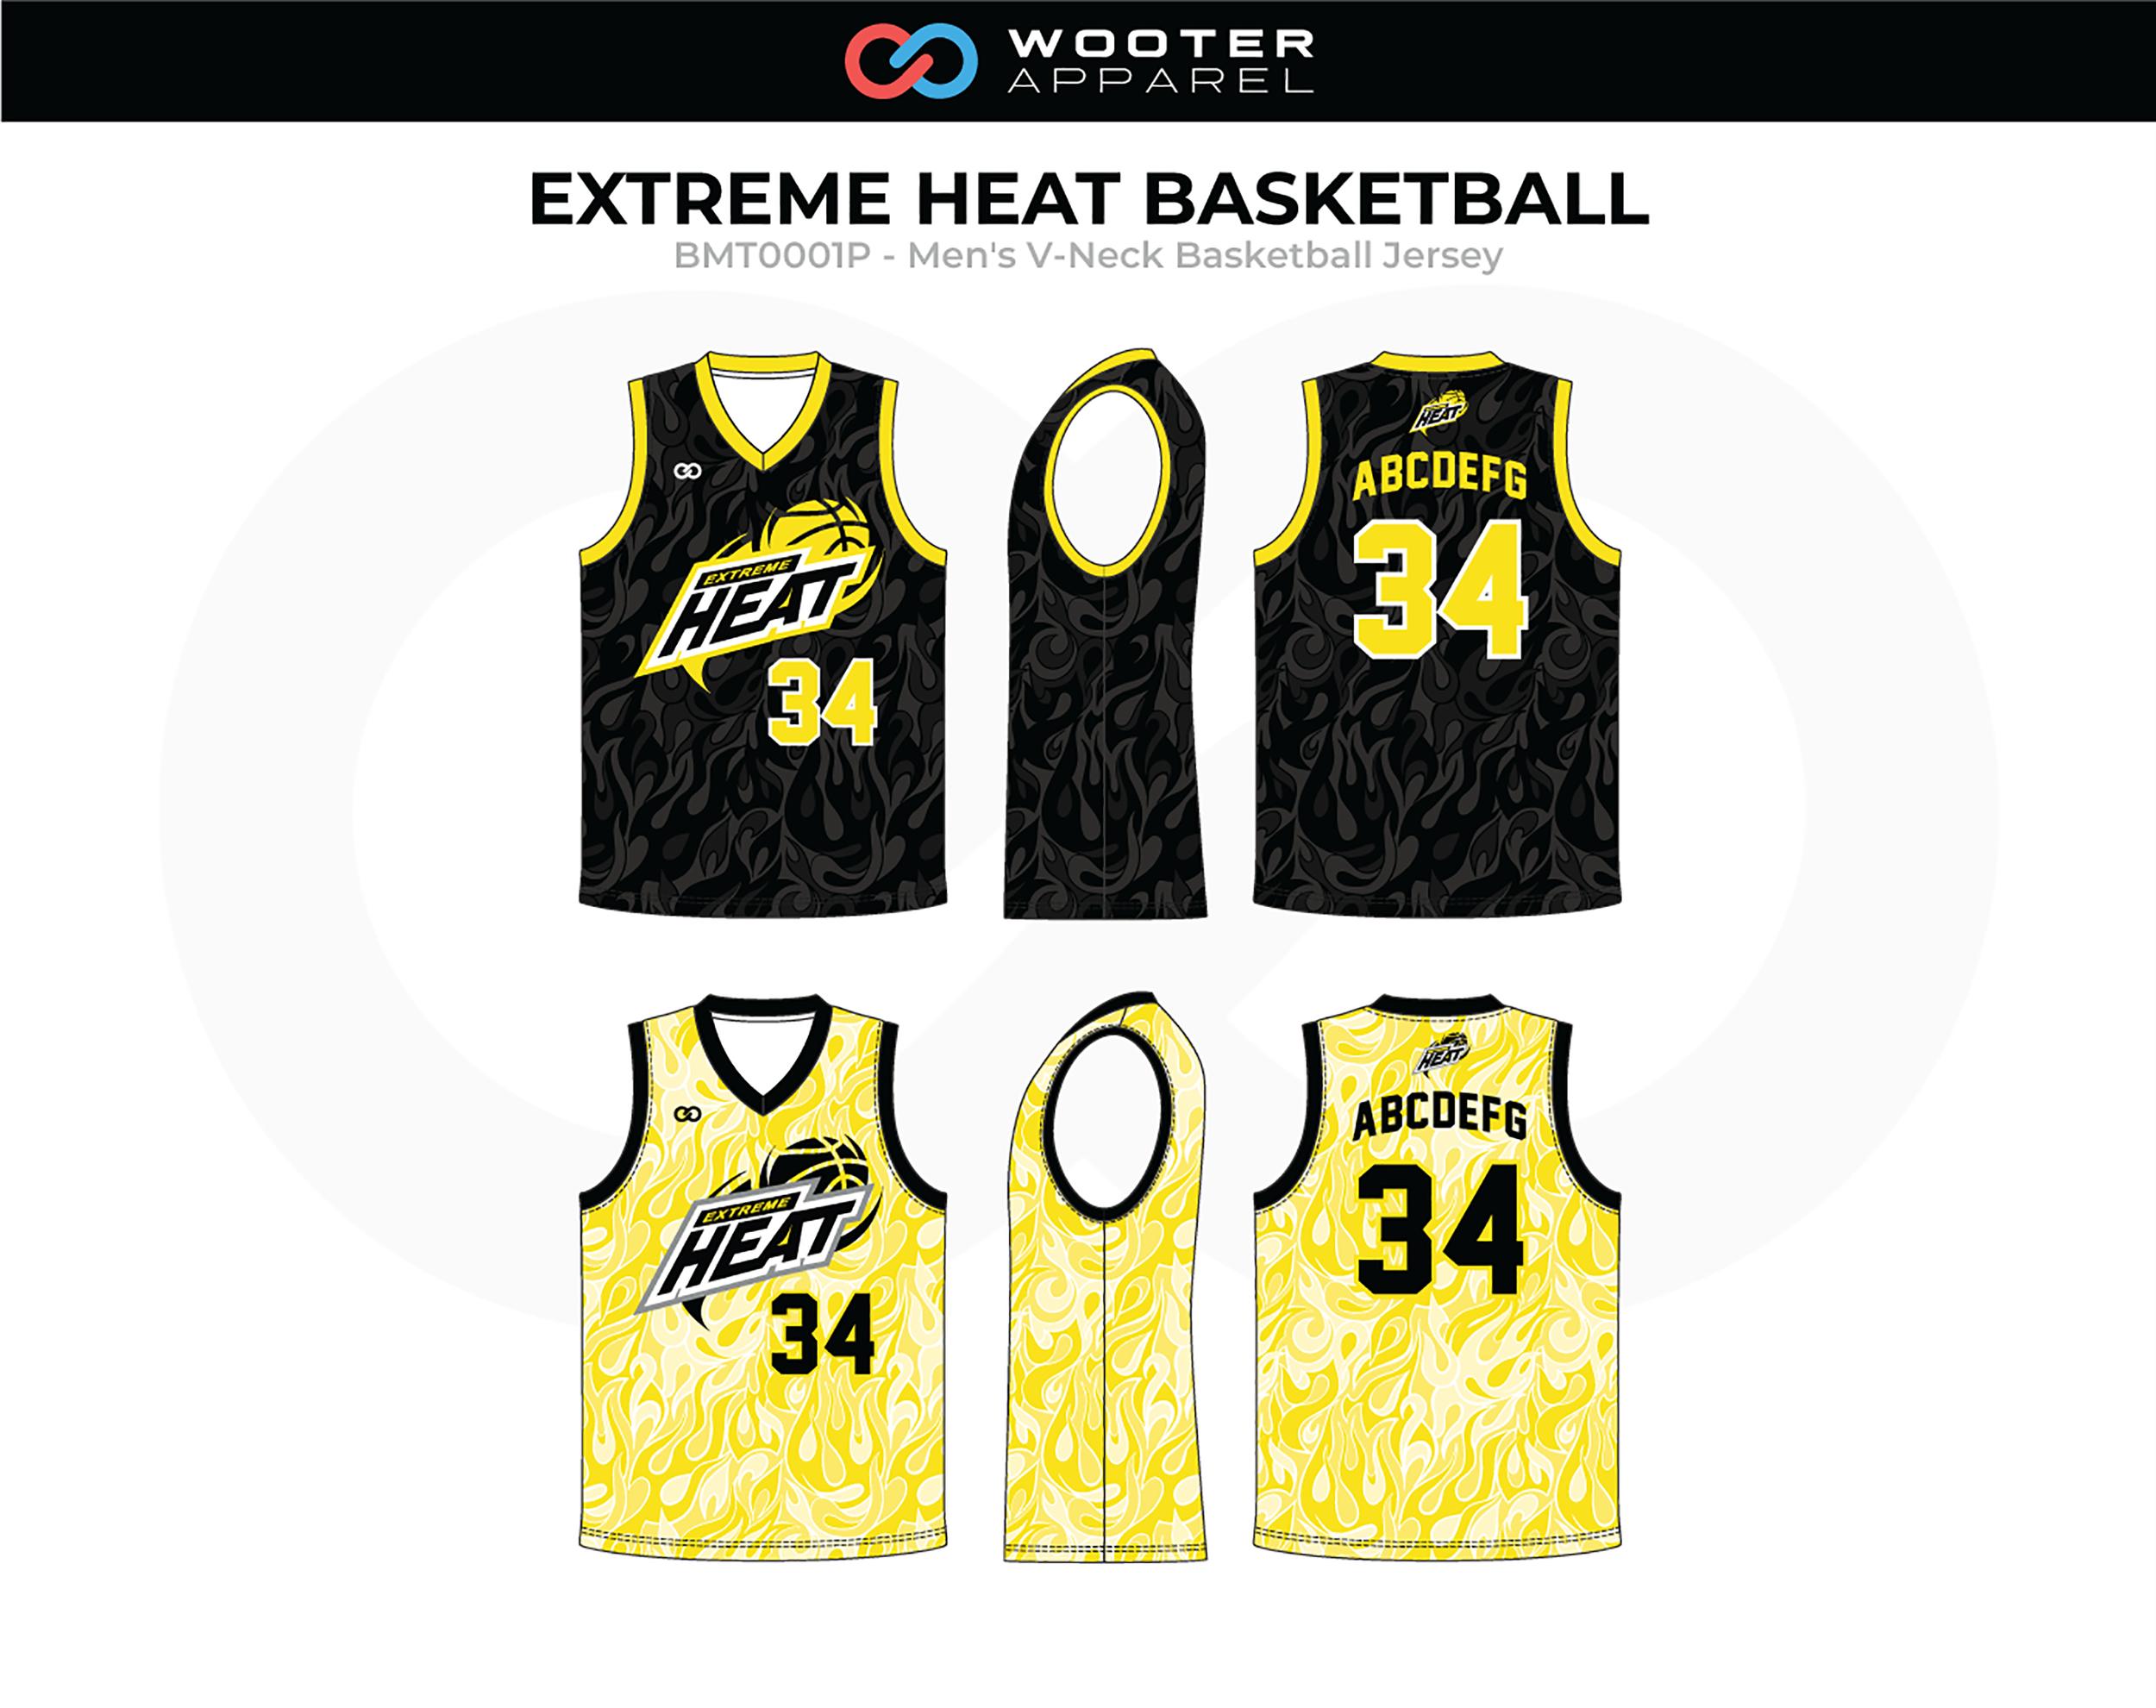 ExtremeHeatBasketball_JerseyMockupV1.png